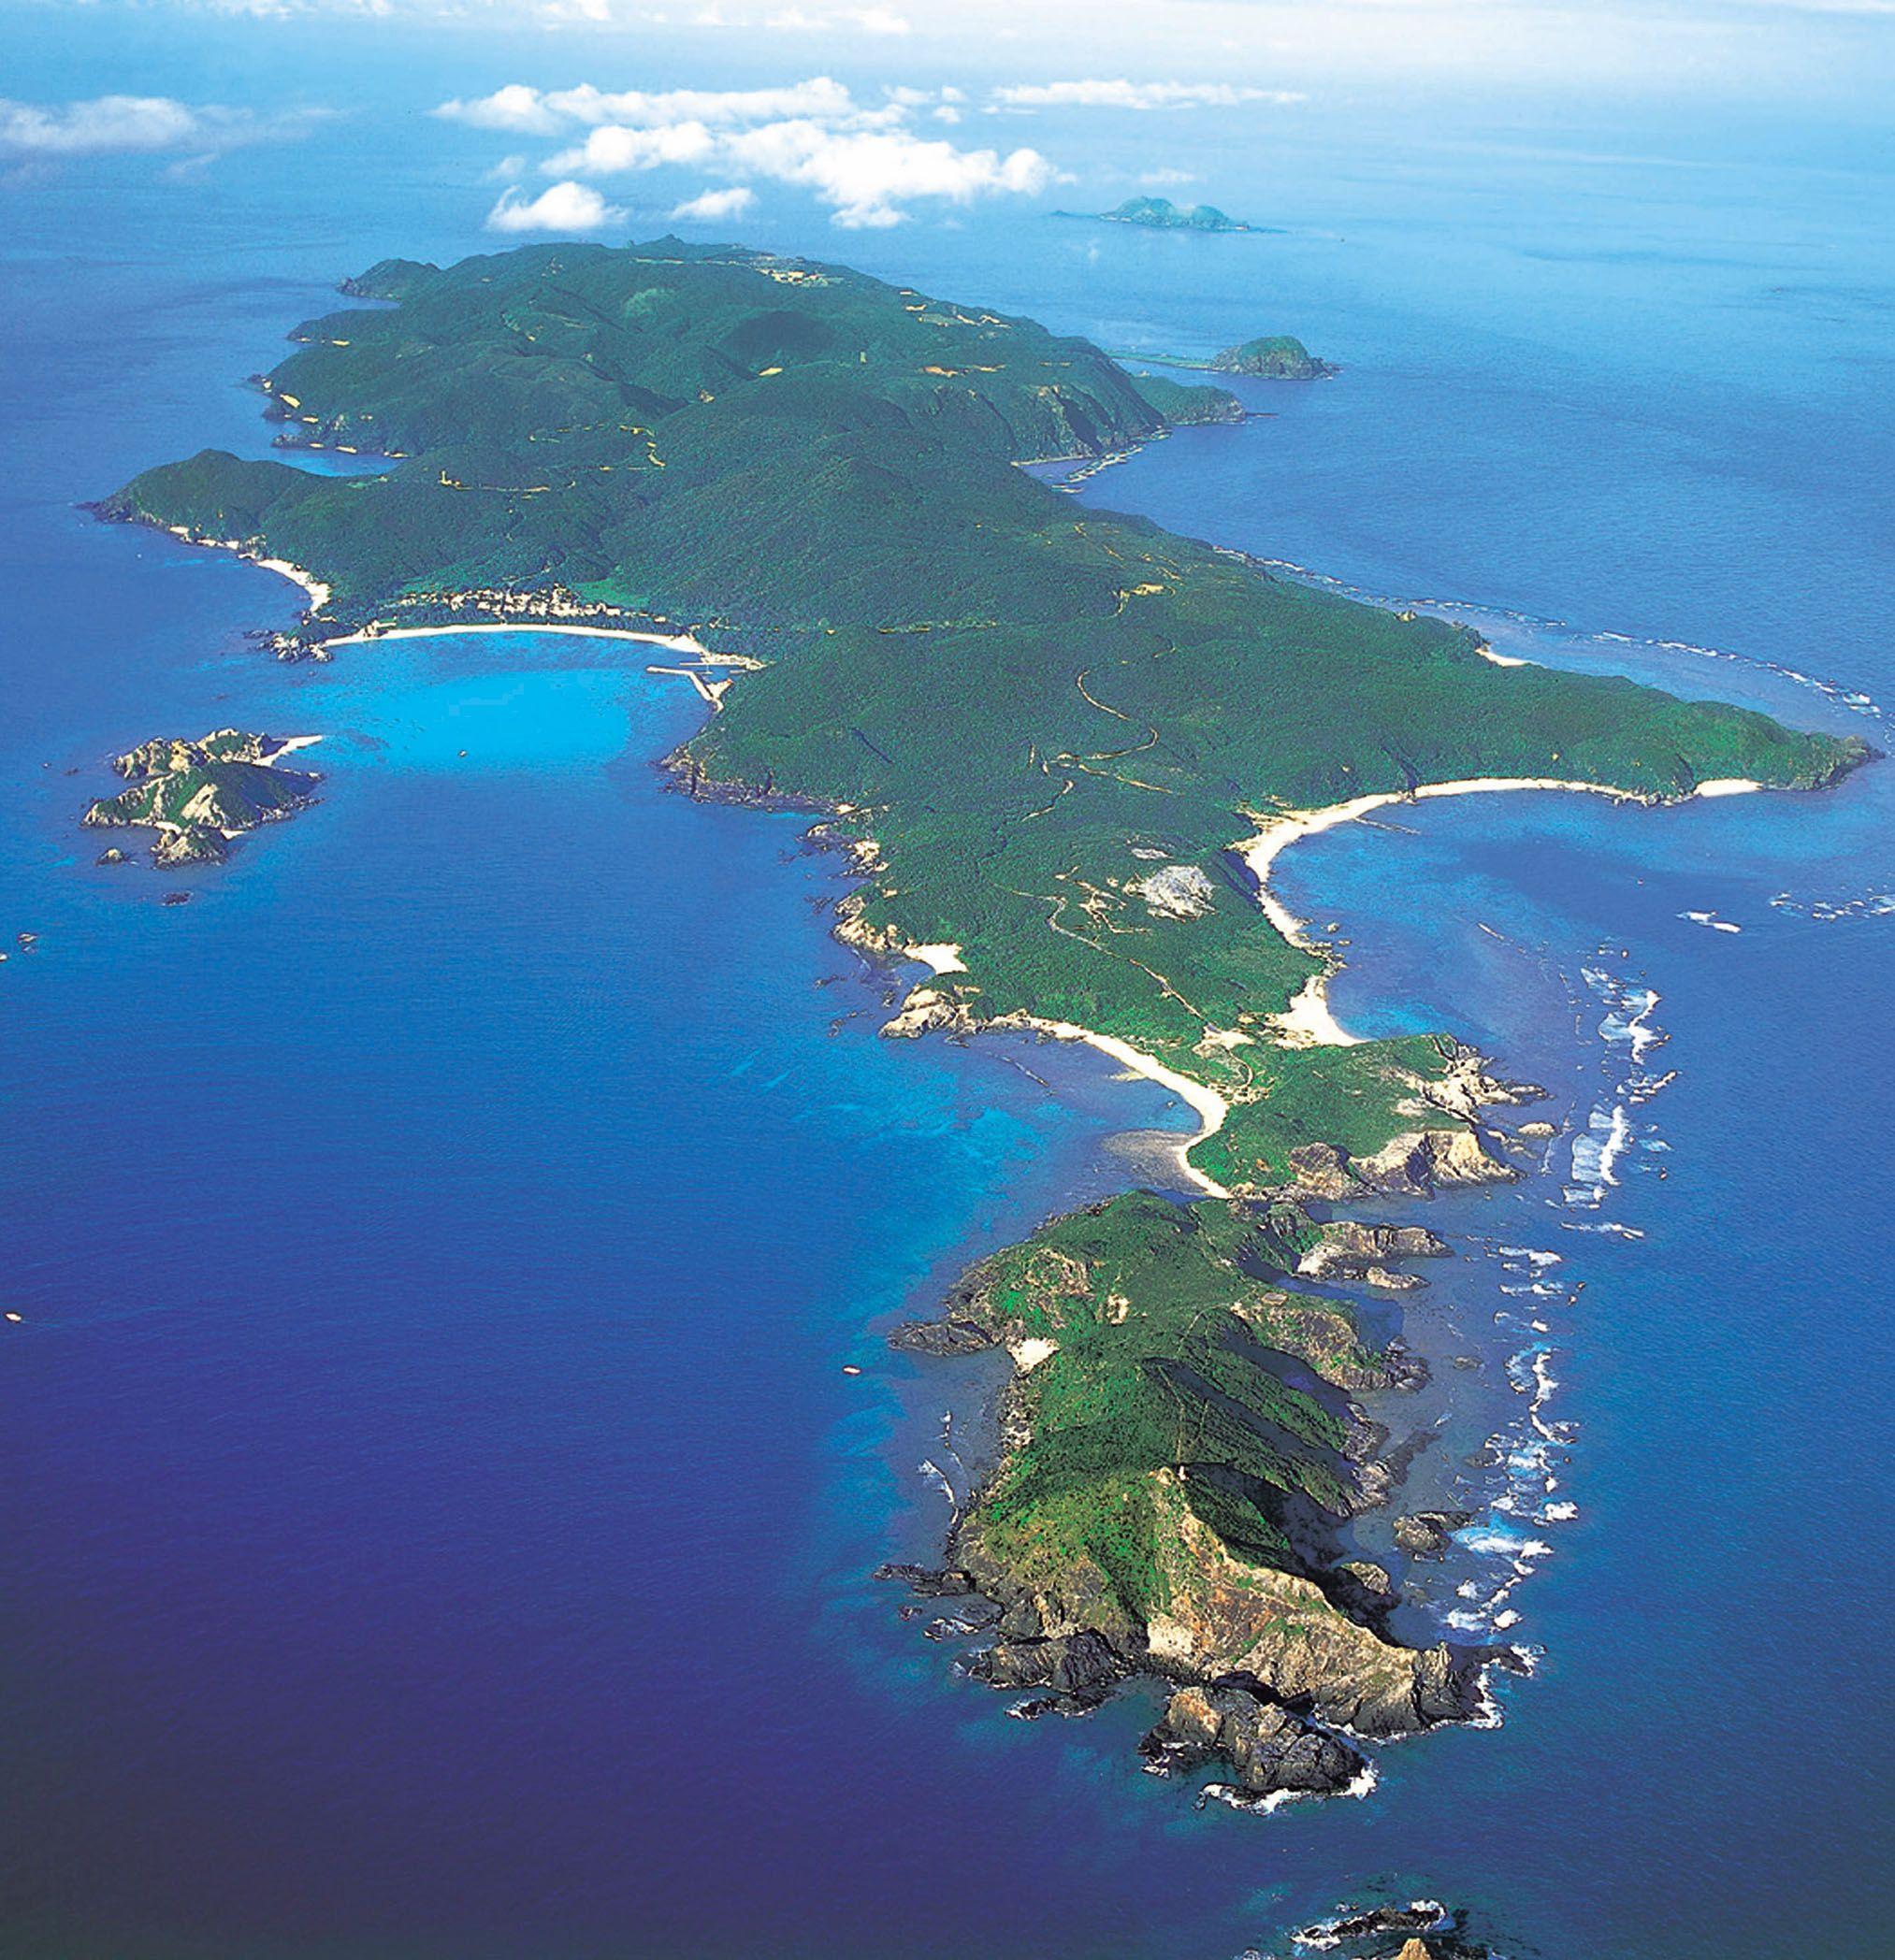 Aerial of Tokashiki Island, Okinawa, Japan ✯ ωнιмѕу ѕαη∂у ...